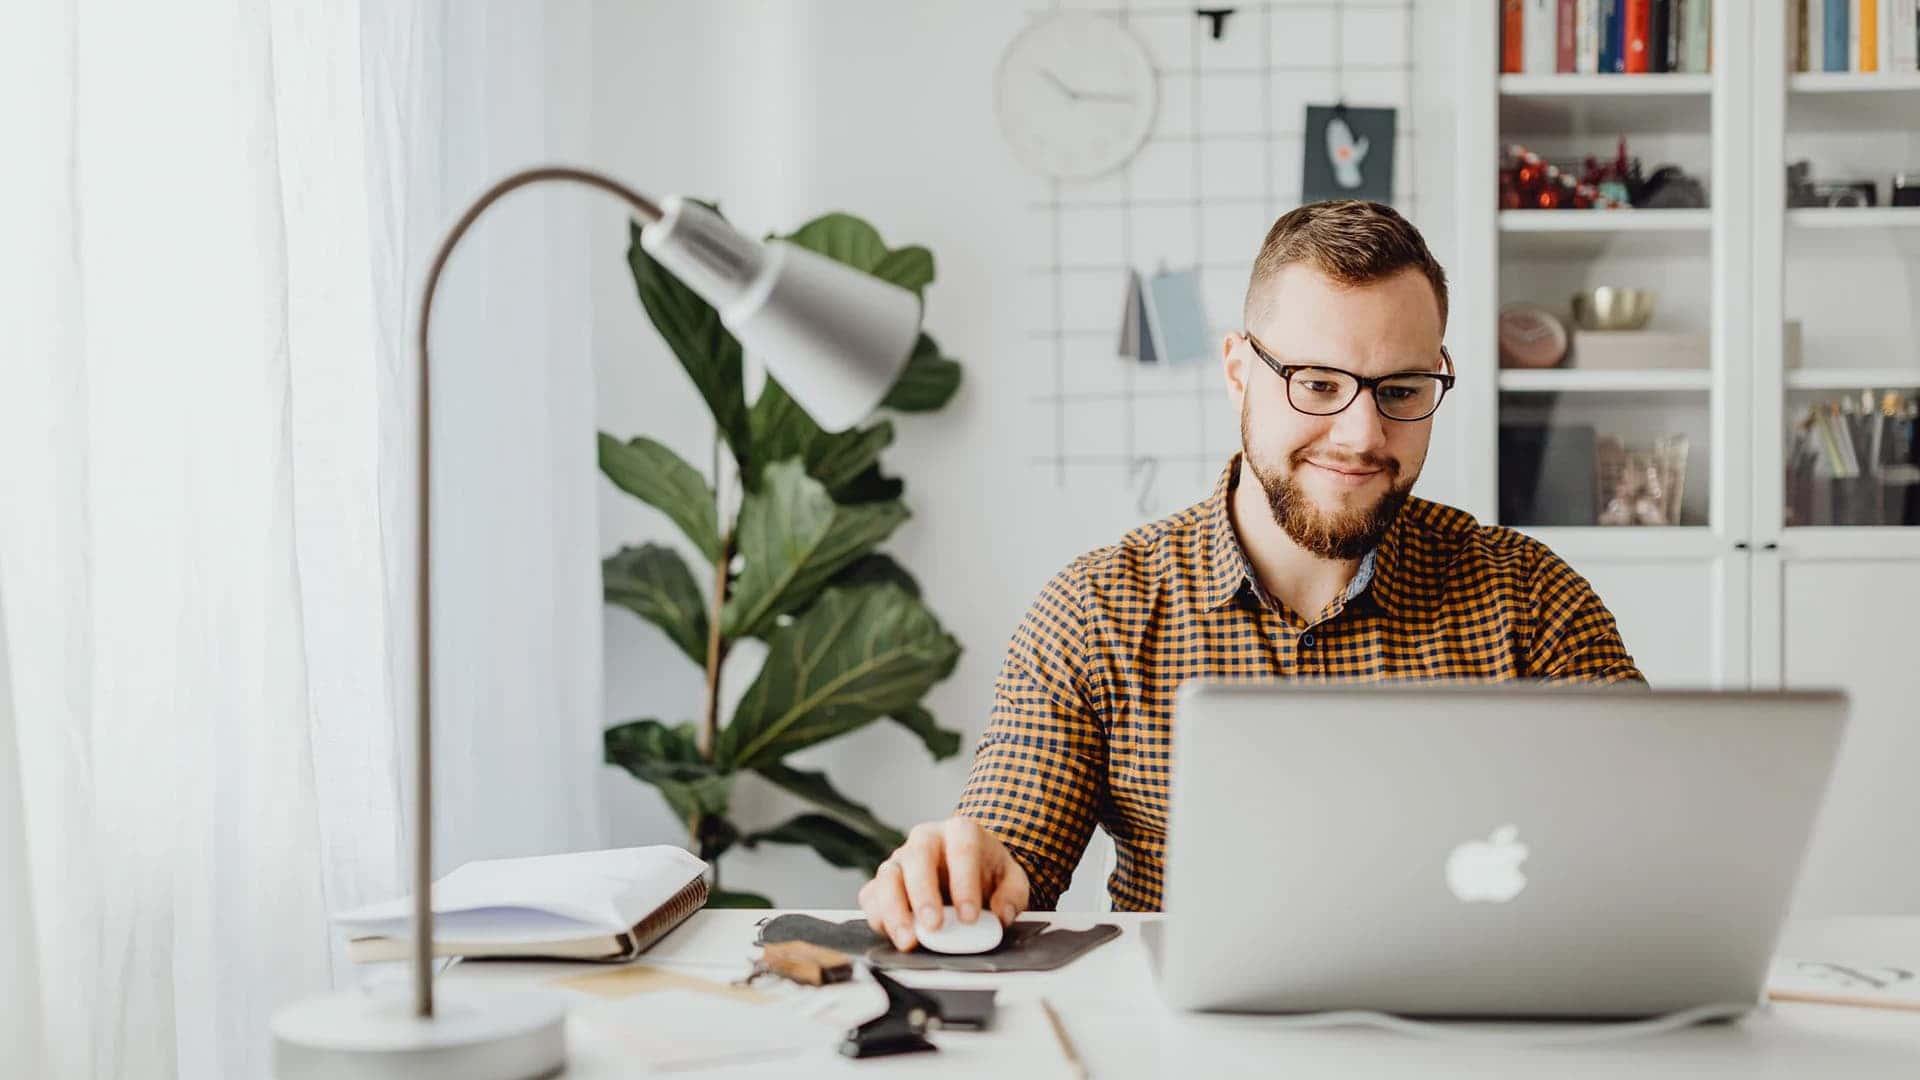 Persona seduta sorridente al PC portatile